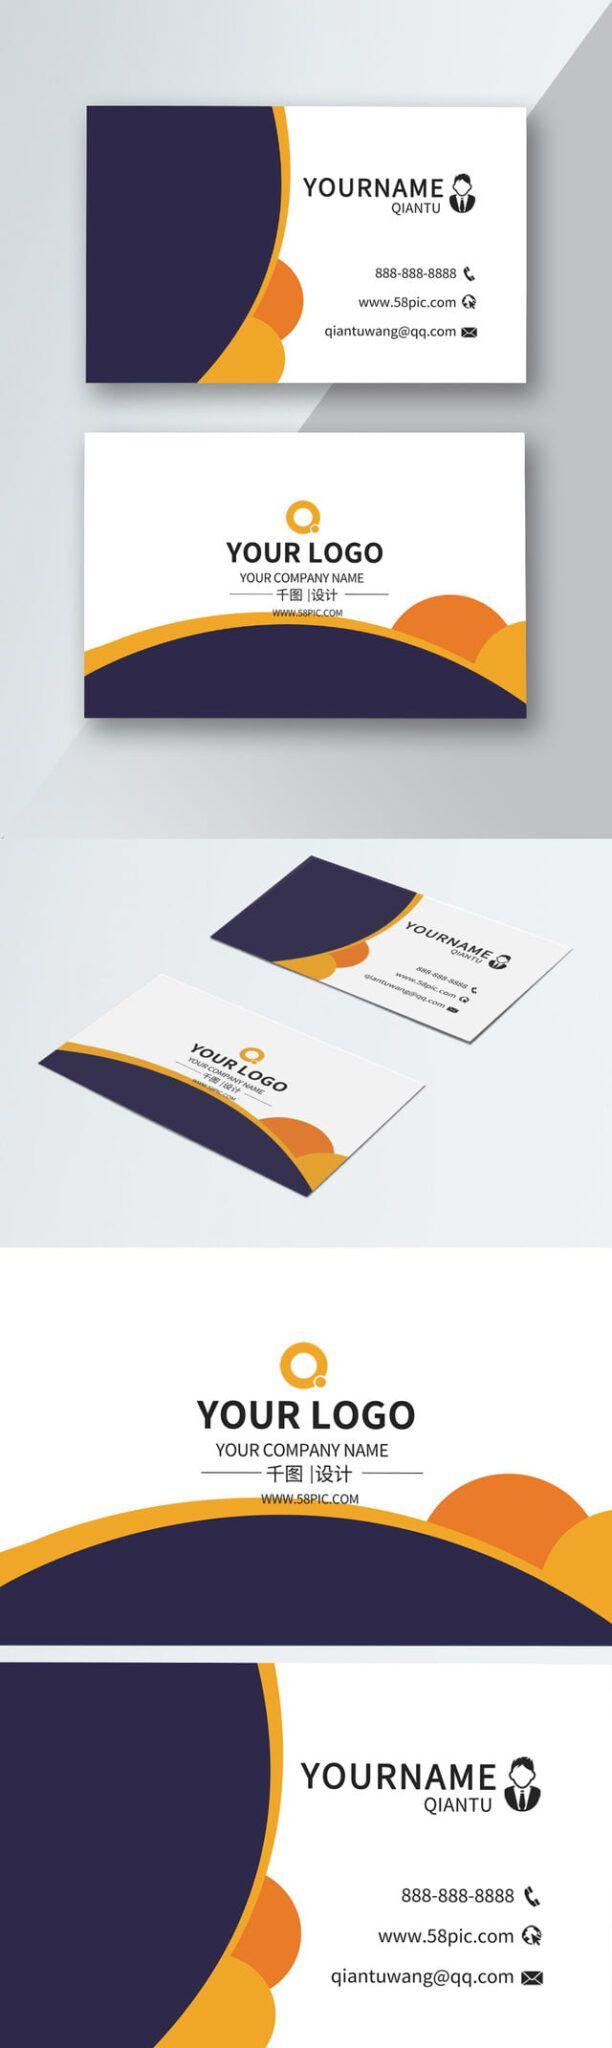 Yuantong Express Yuantong Express Business Card Personal Within Free Personal Business Card Business Cards Simple Simple Business Cards Personal Business Cards